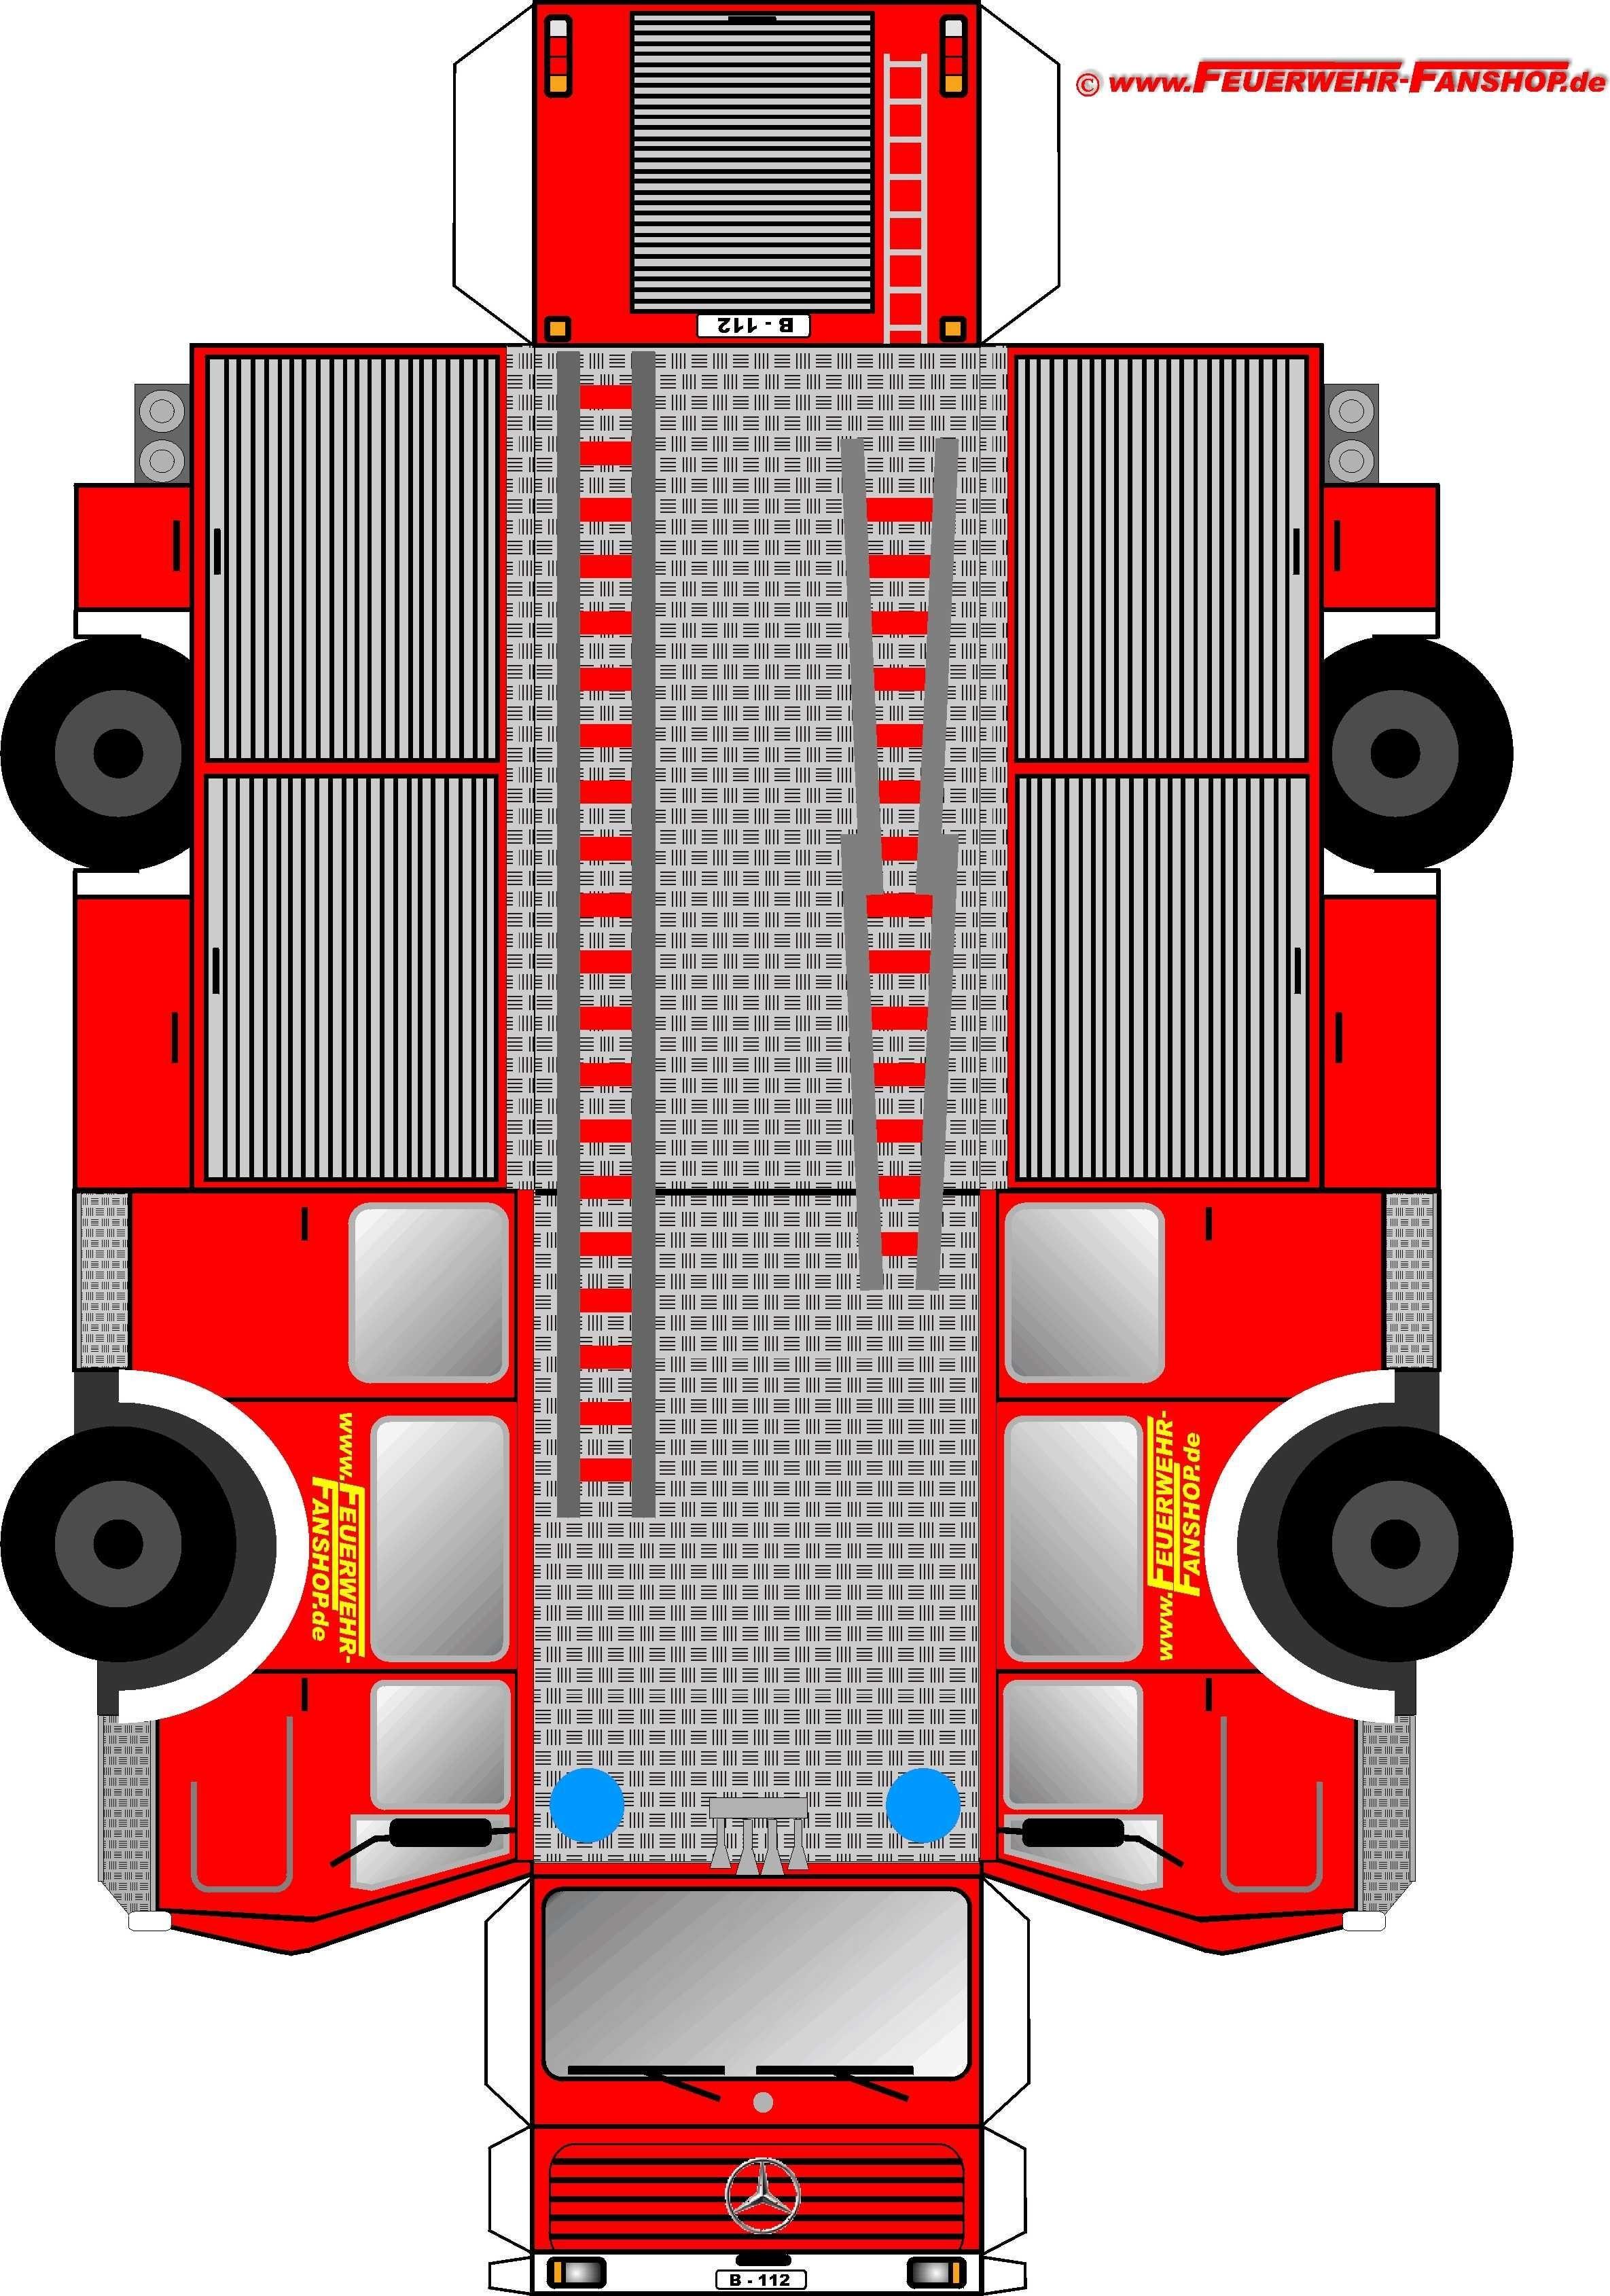 Papercraft Jeep Feuerwehrauto Basteln Papr Pinterest